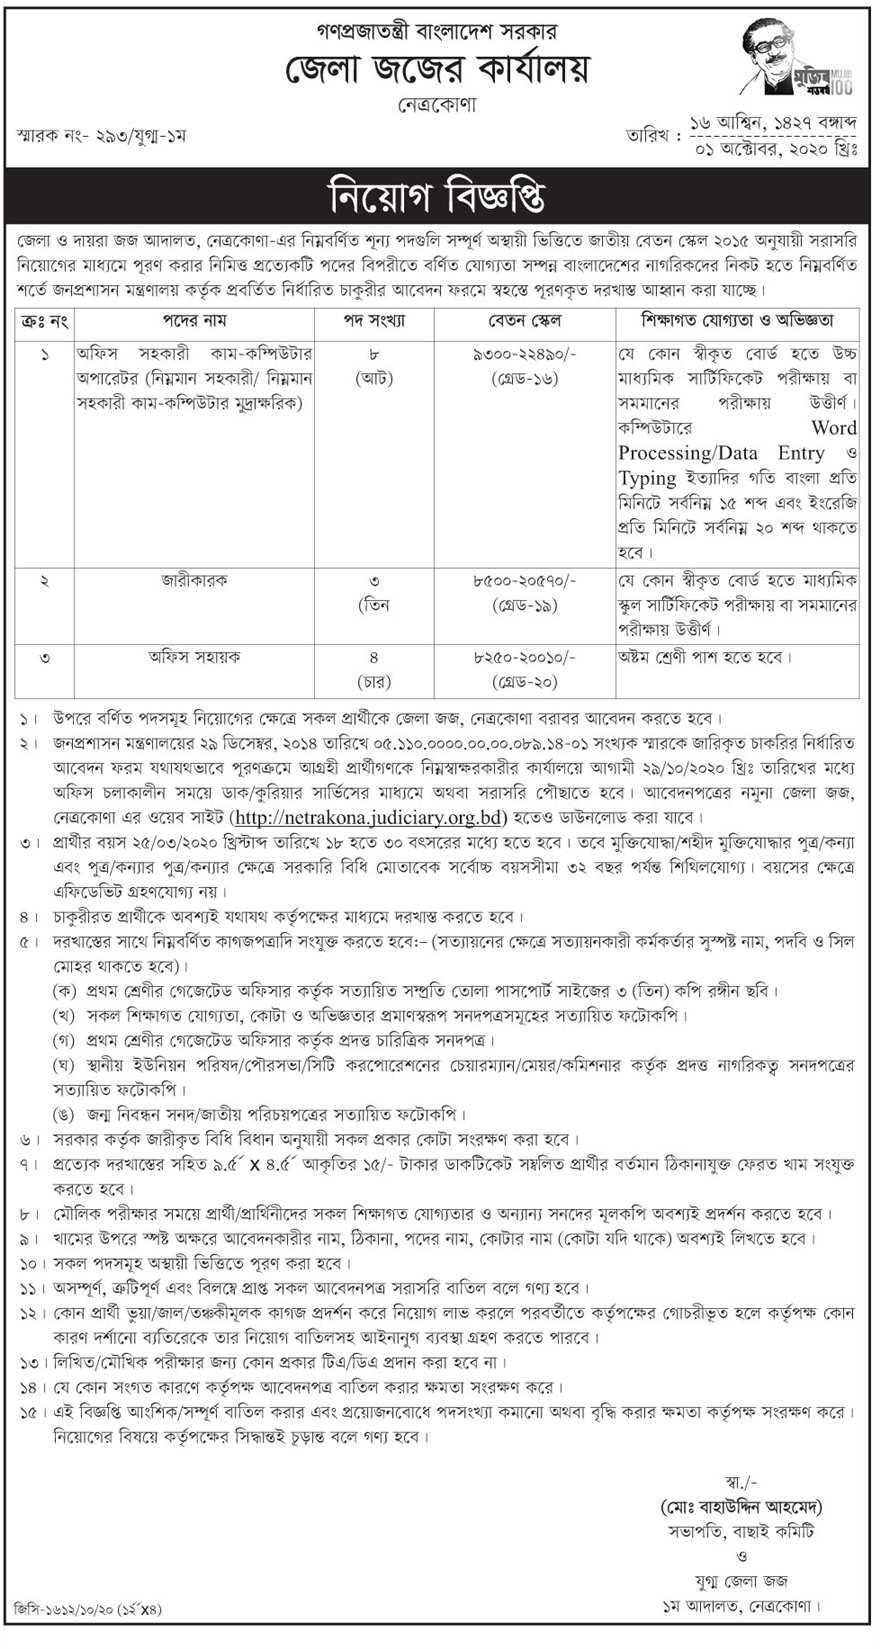 District Judges Office Job Circular